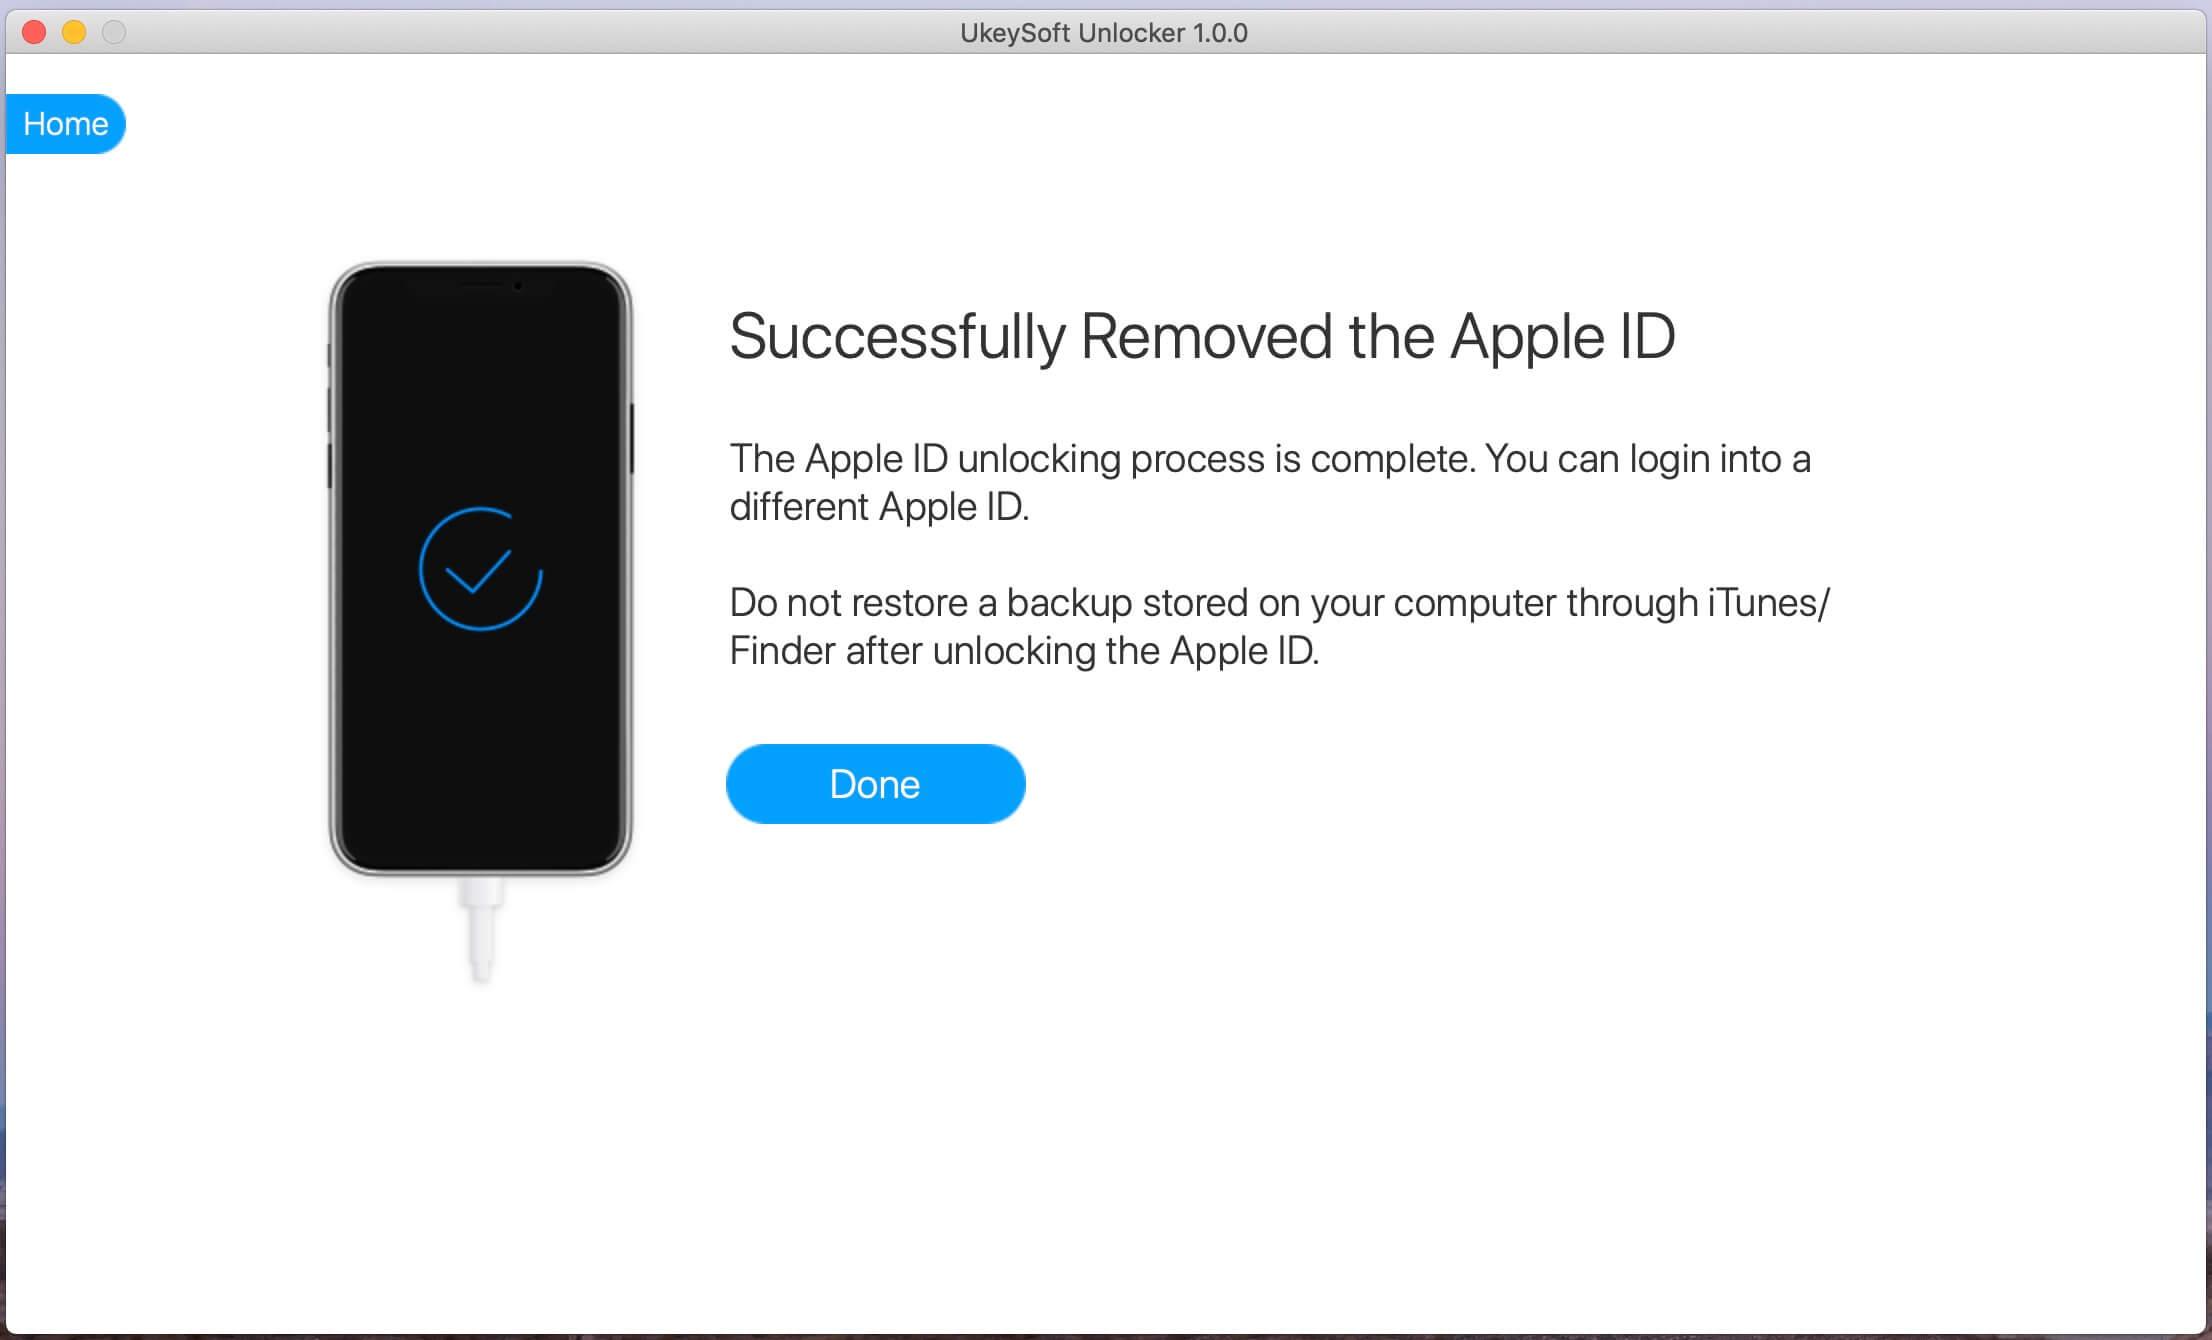 идентификатор яблока удален